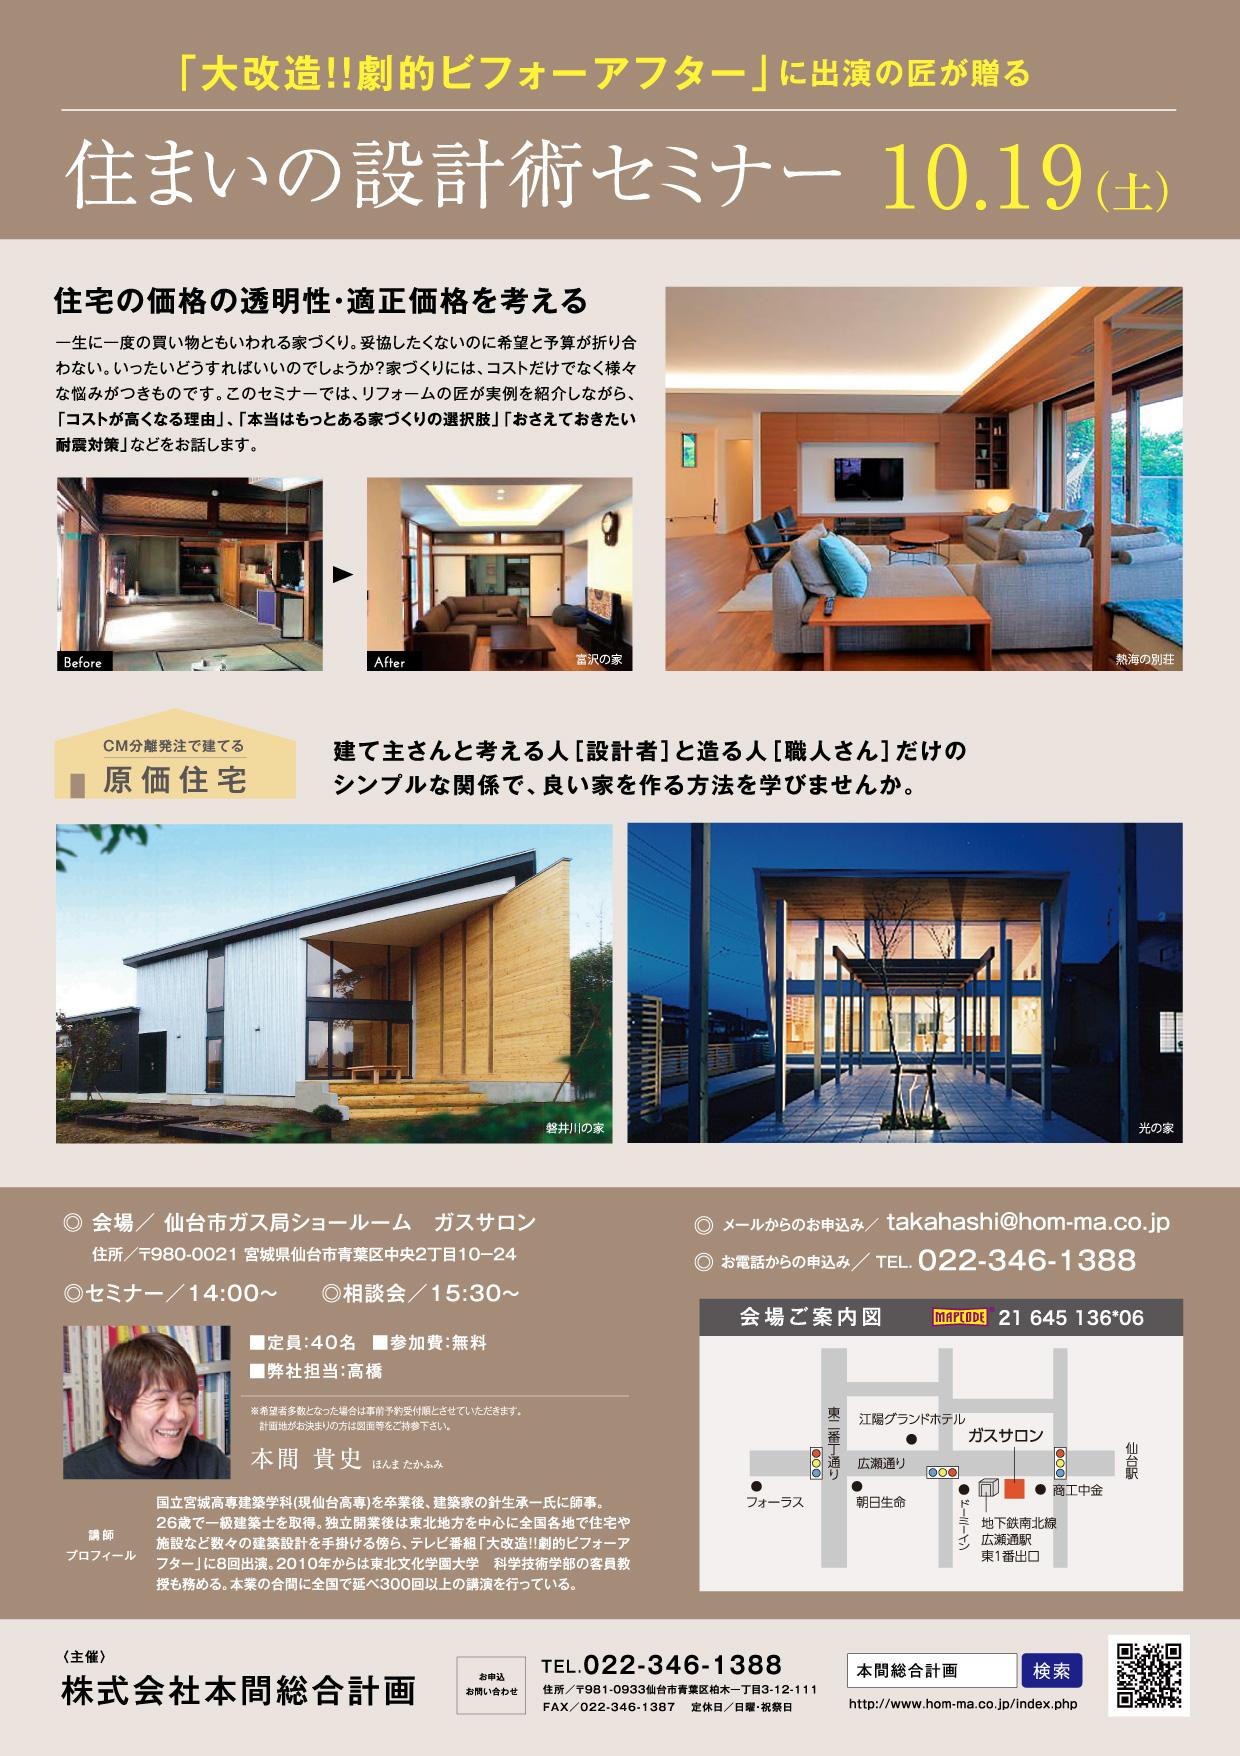 https://www.iehito.co.jp/information/images/20191019%E3%82%BB%E3%83%9F%E3%83%8A%E3%83%BC.jpg